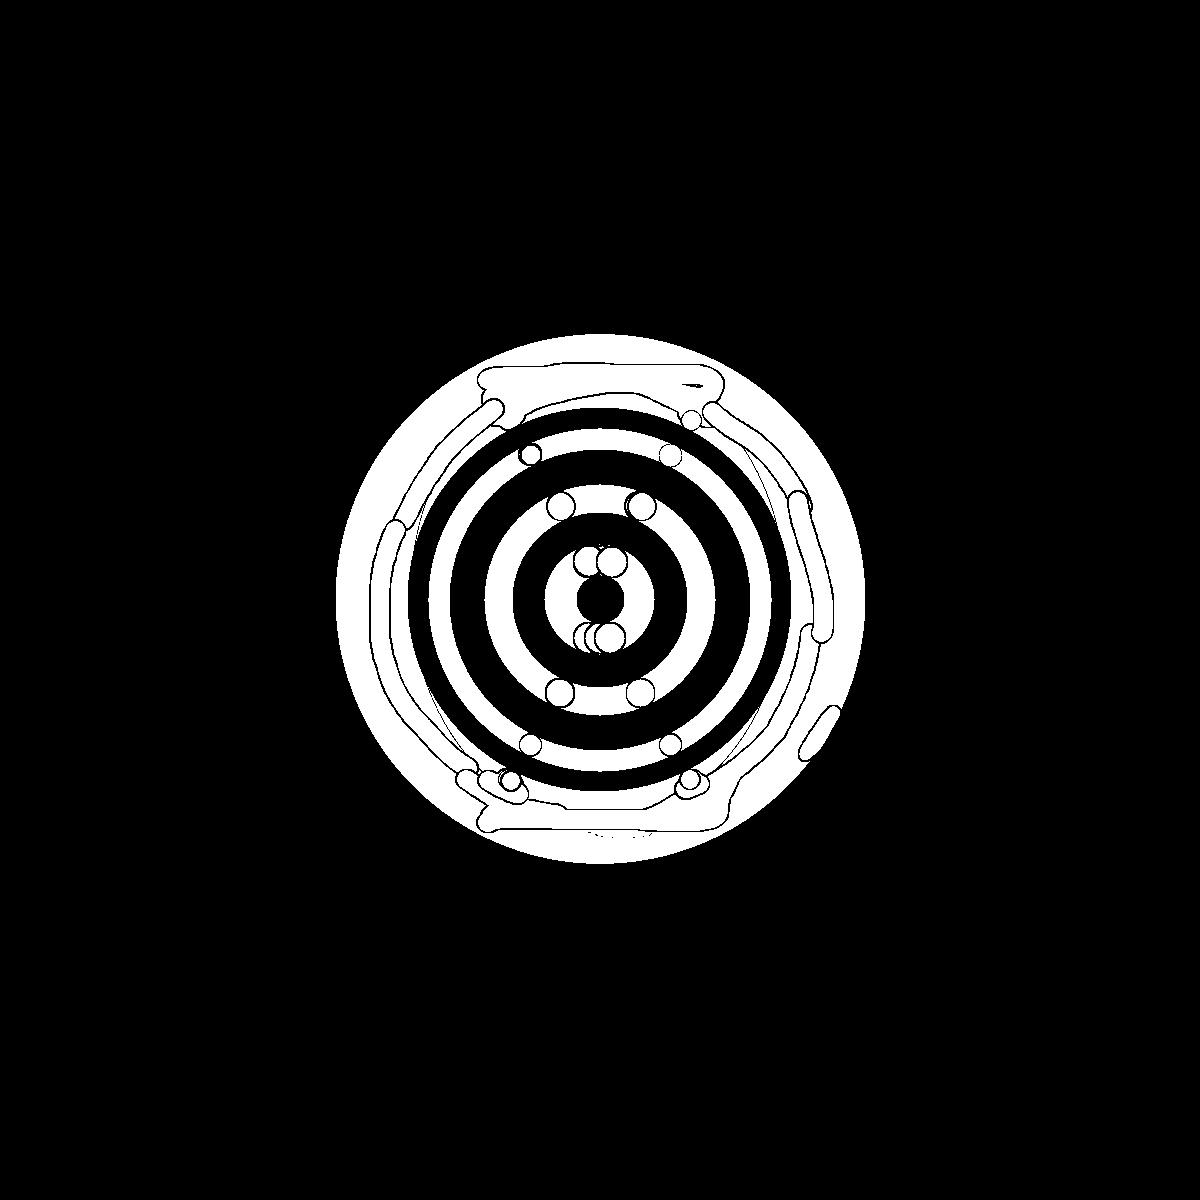 hydrozen_01.png